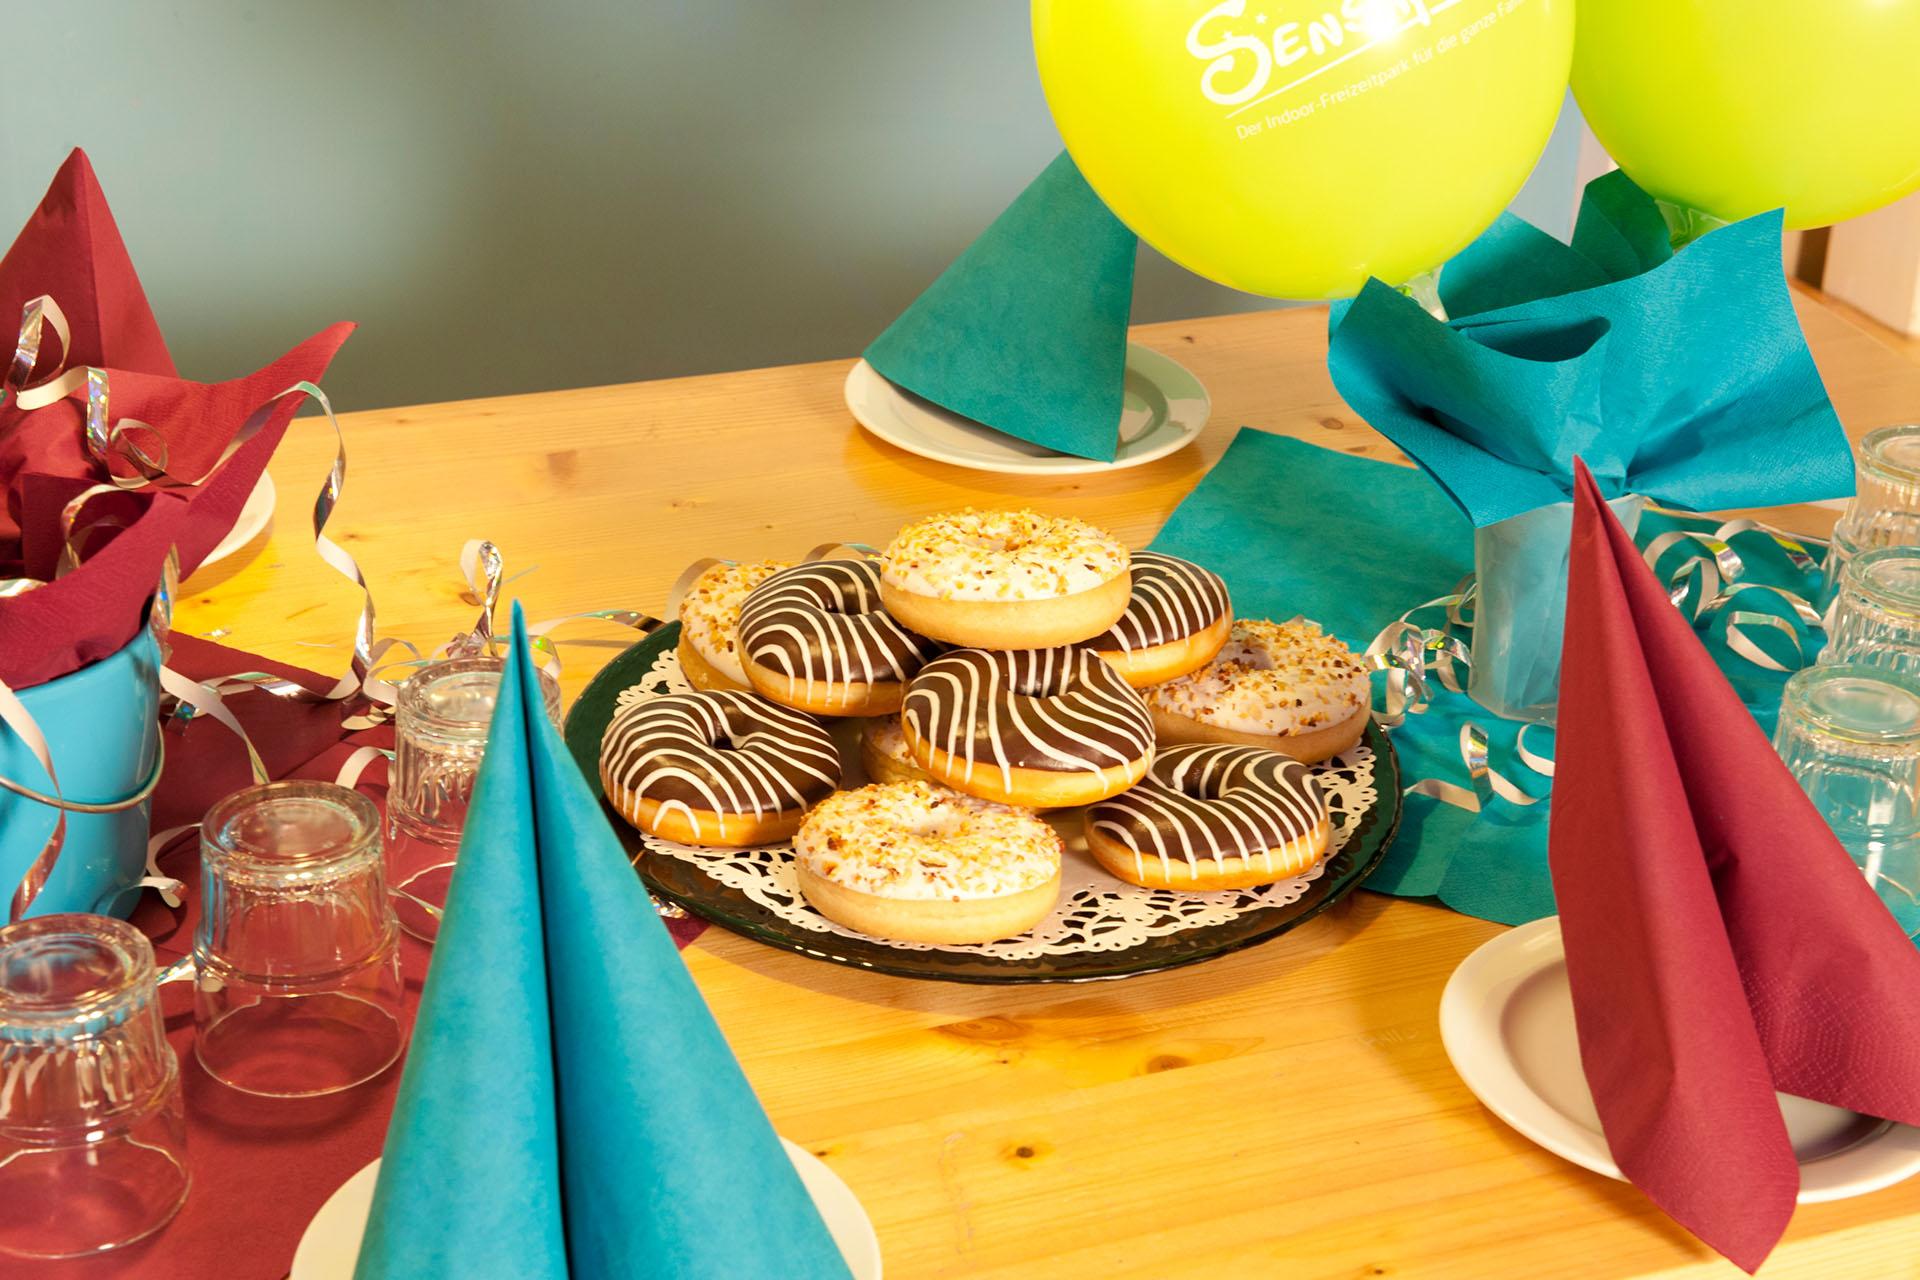 sensapolis-indoor-freizeitpark-kindergeburtstag-donuts-sindelfingen-10